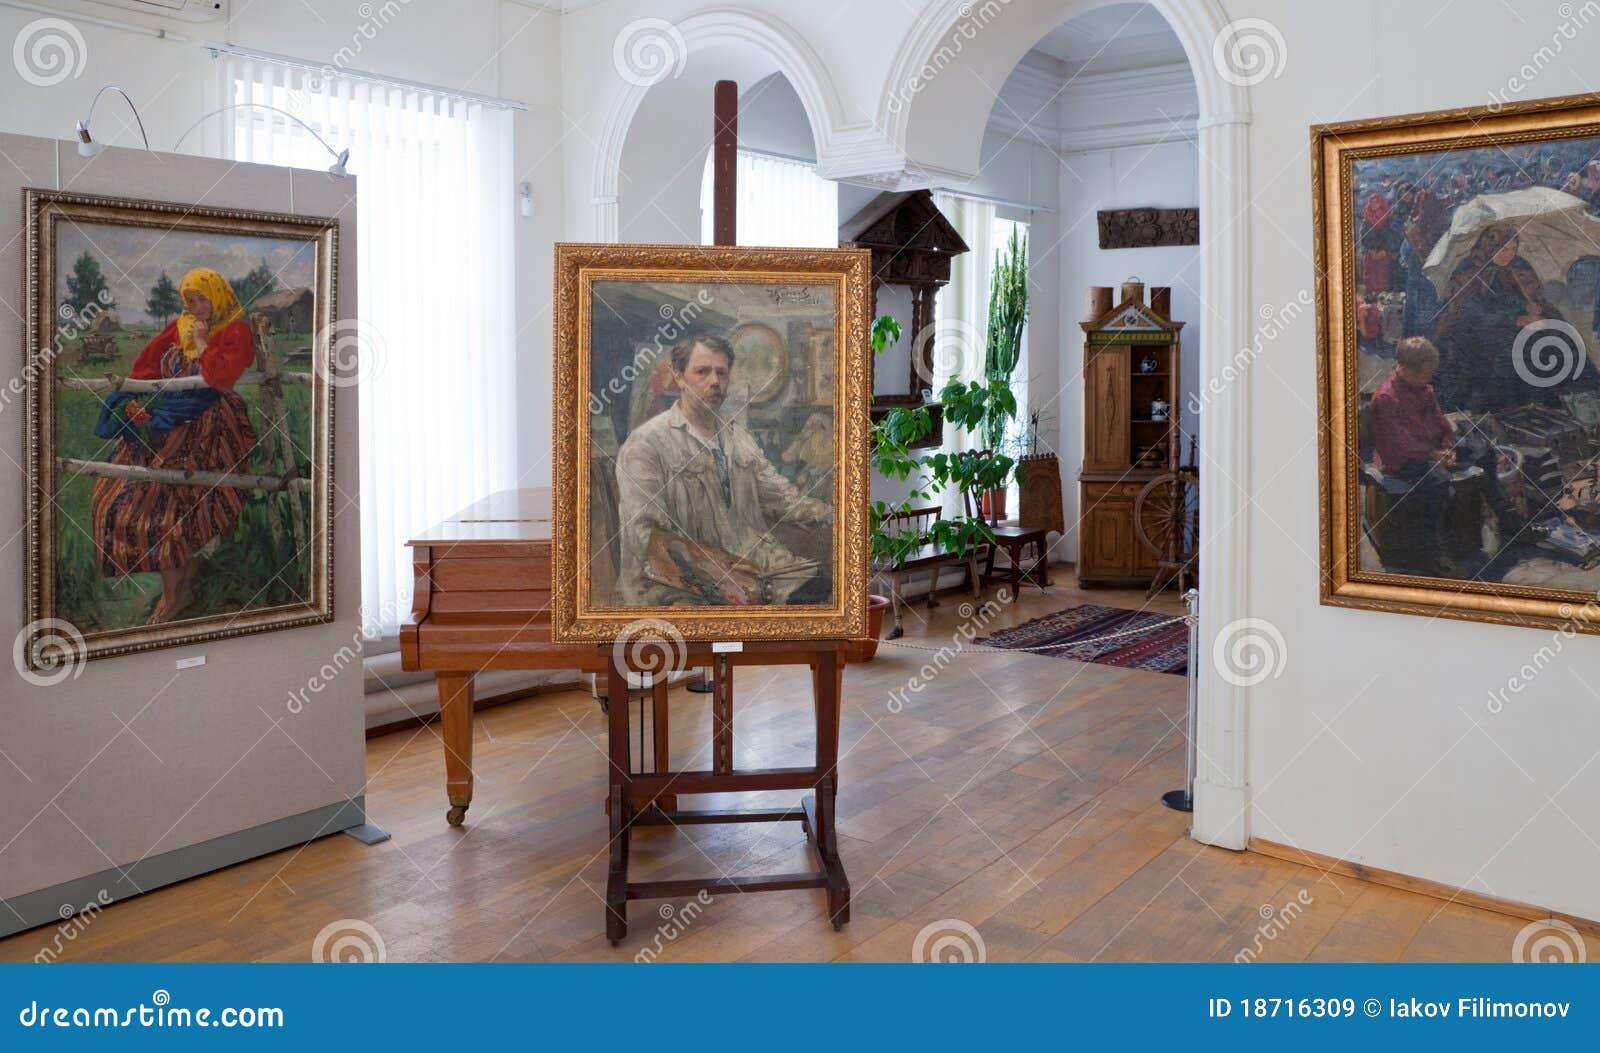 1875 1941 kulikov galery художника ivan